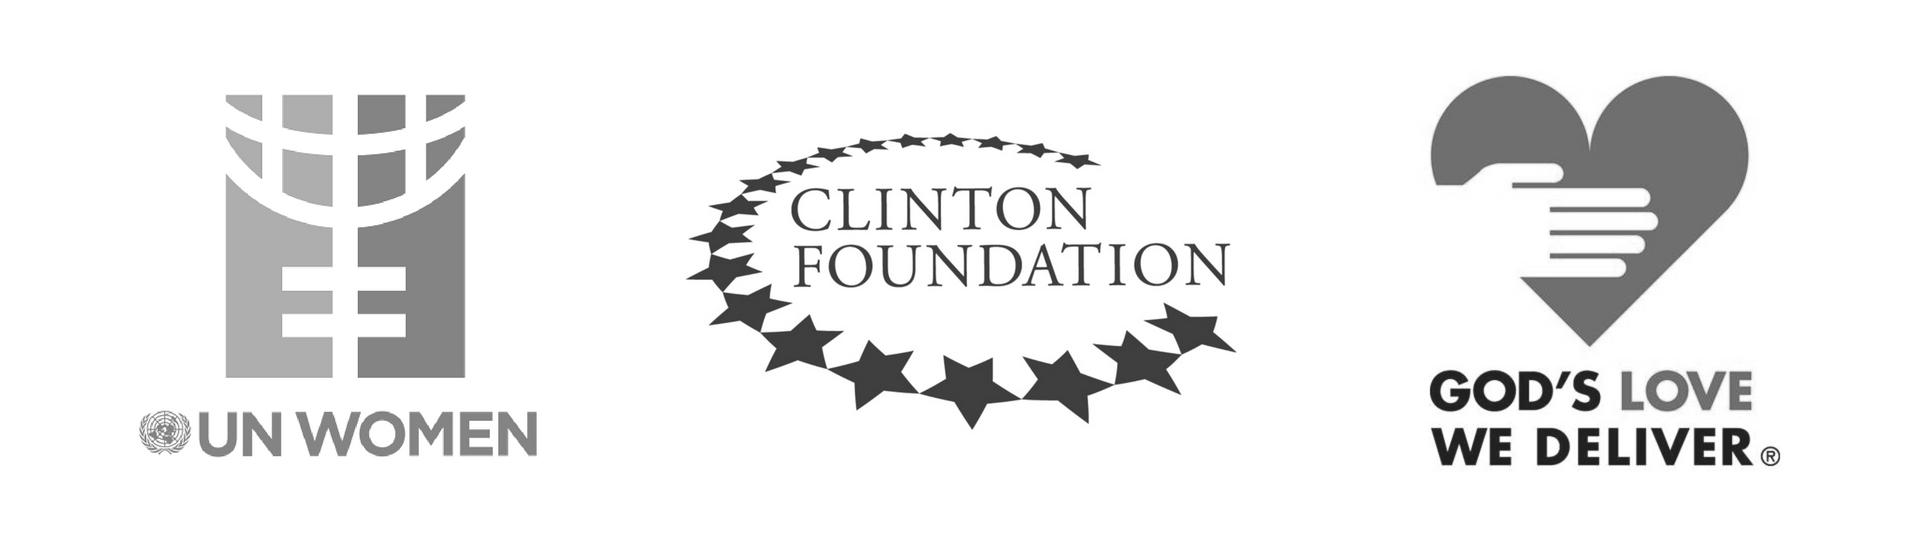 Devon Smiley Negotiation Consultant and Speaker UN Women Clinton Foundation God's Love We Deliver pro bono partnerships